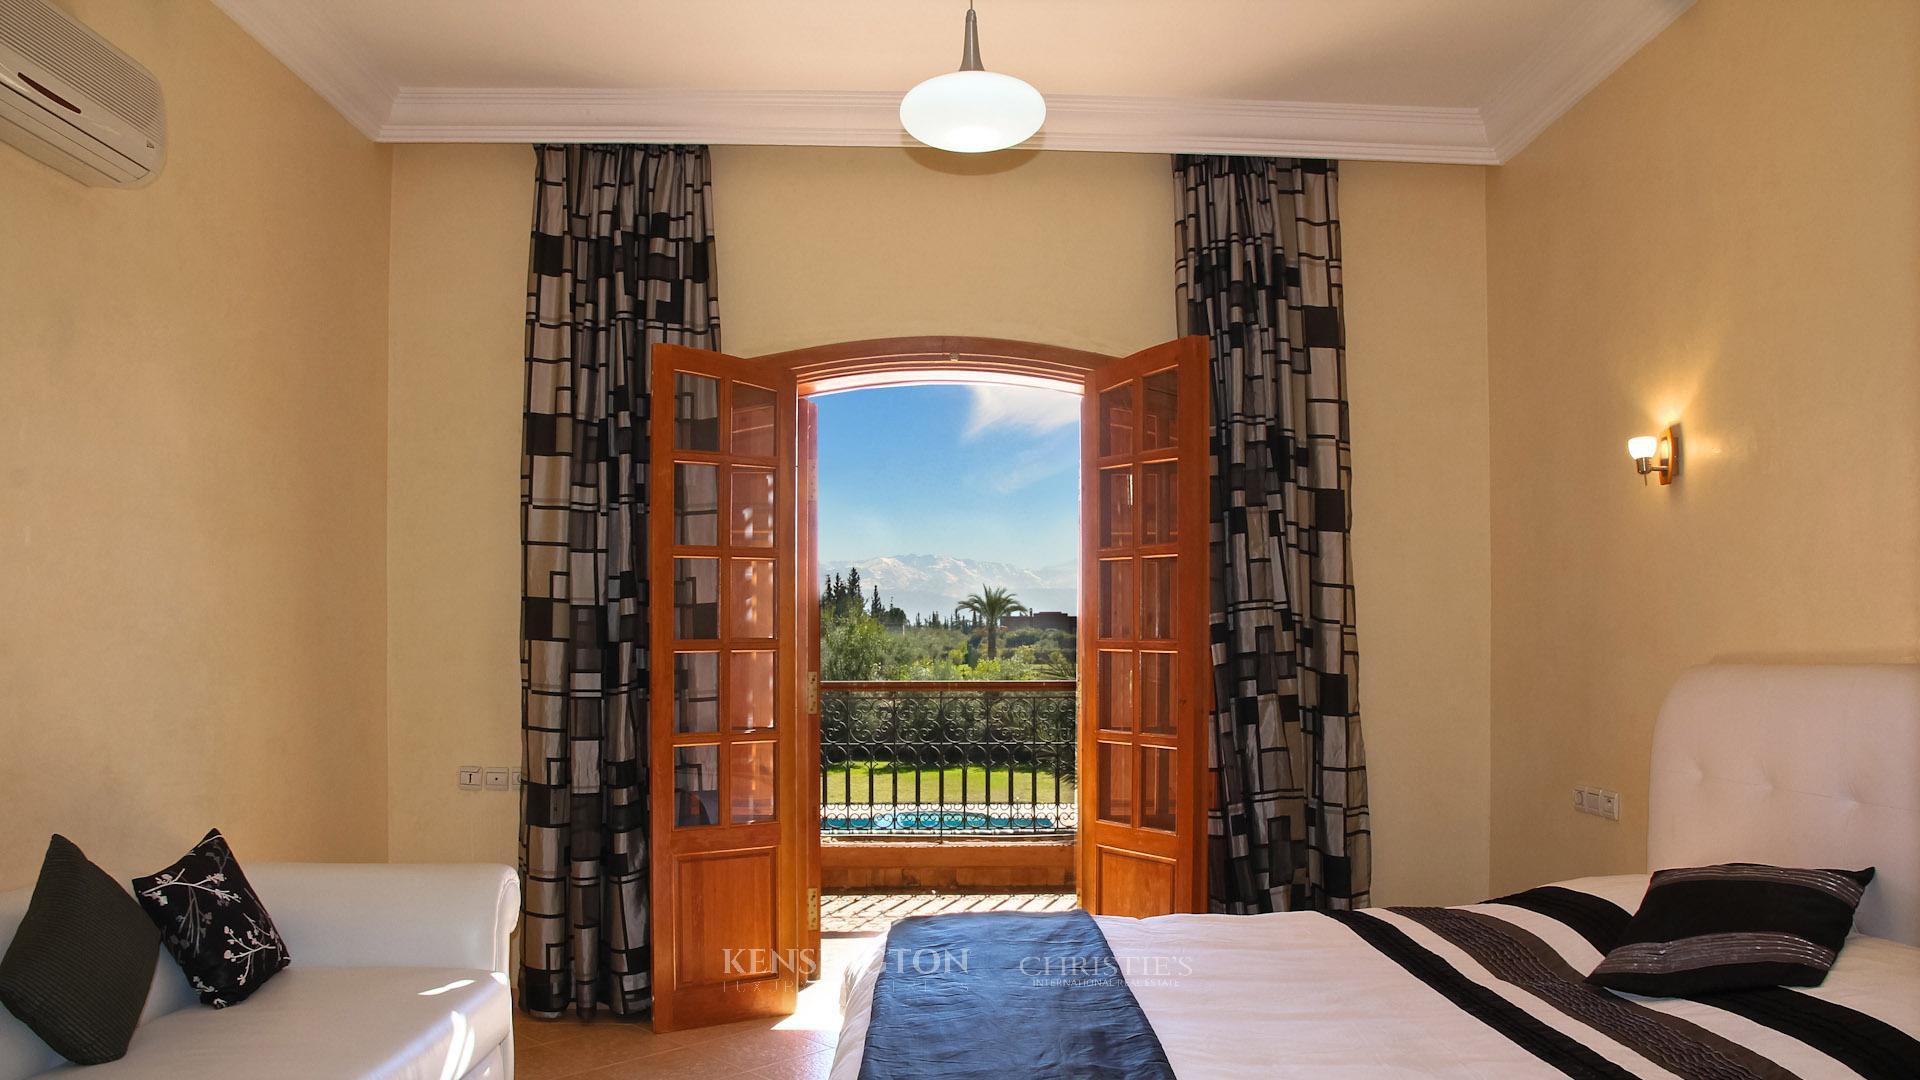 KPPM00944: Villa Bilal Luxury Villa Marrakech Morocco